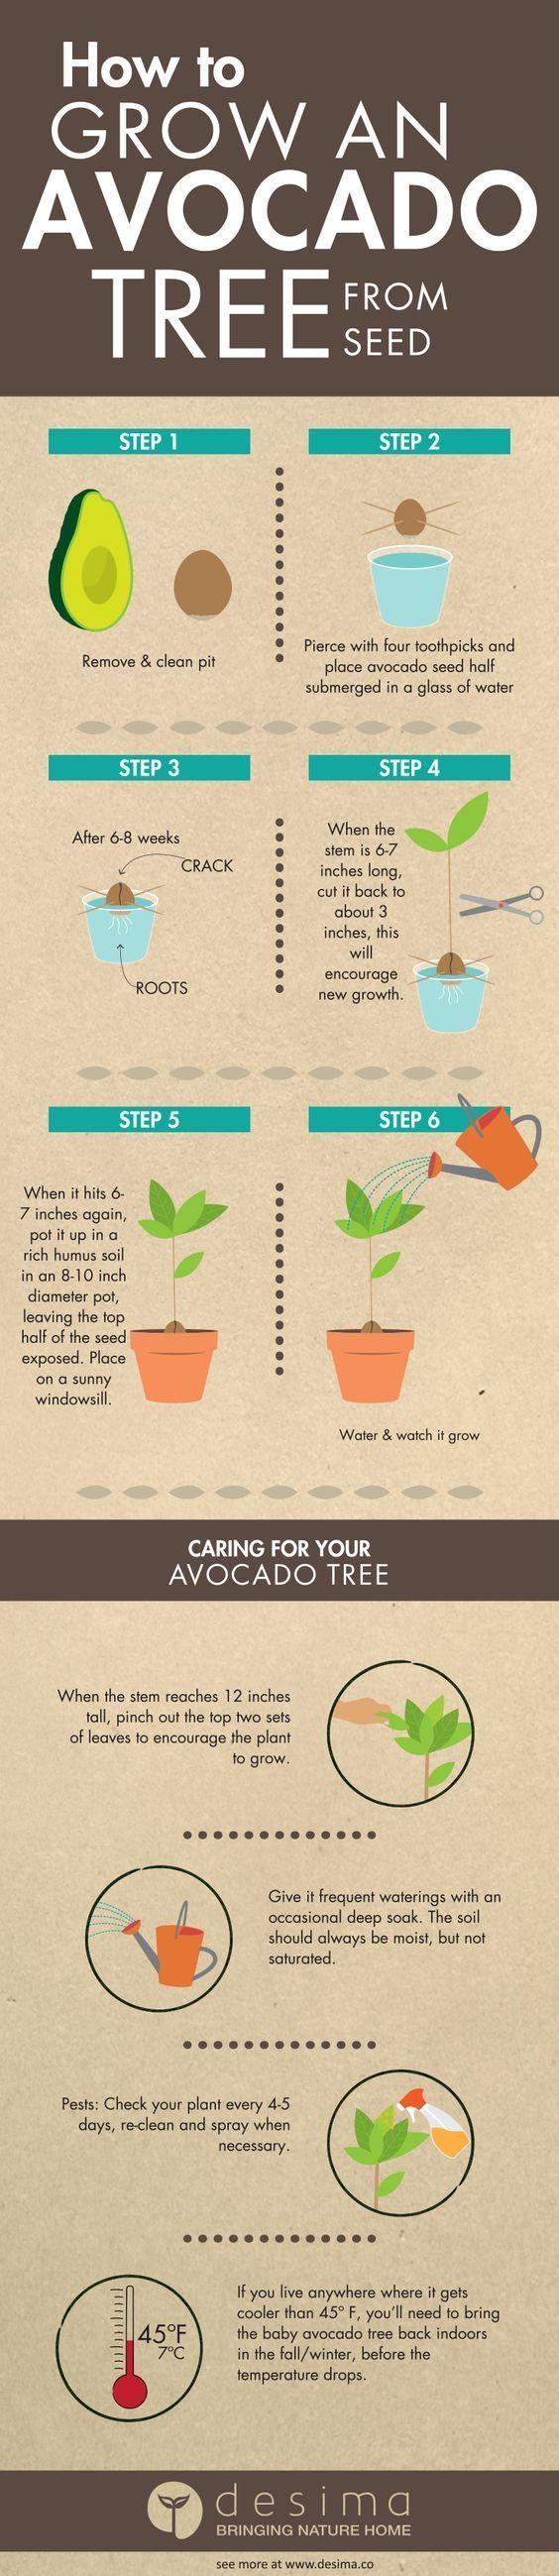 Infographic on how to grow an avocado tree from seed.: #howtogrowagarden #Vegetablegardenbasics